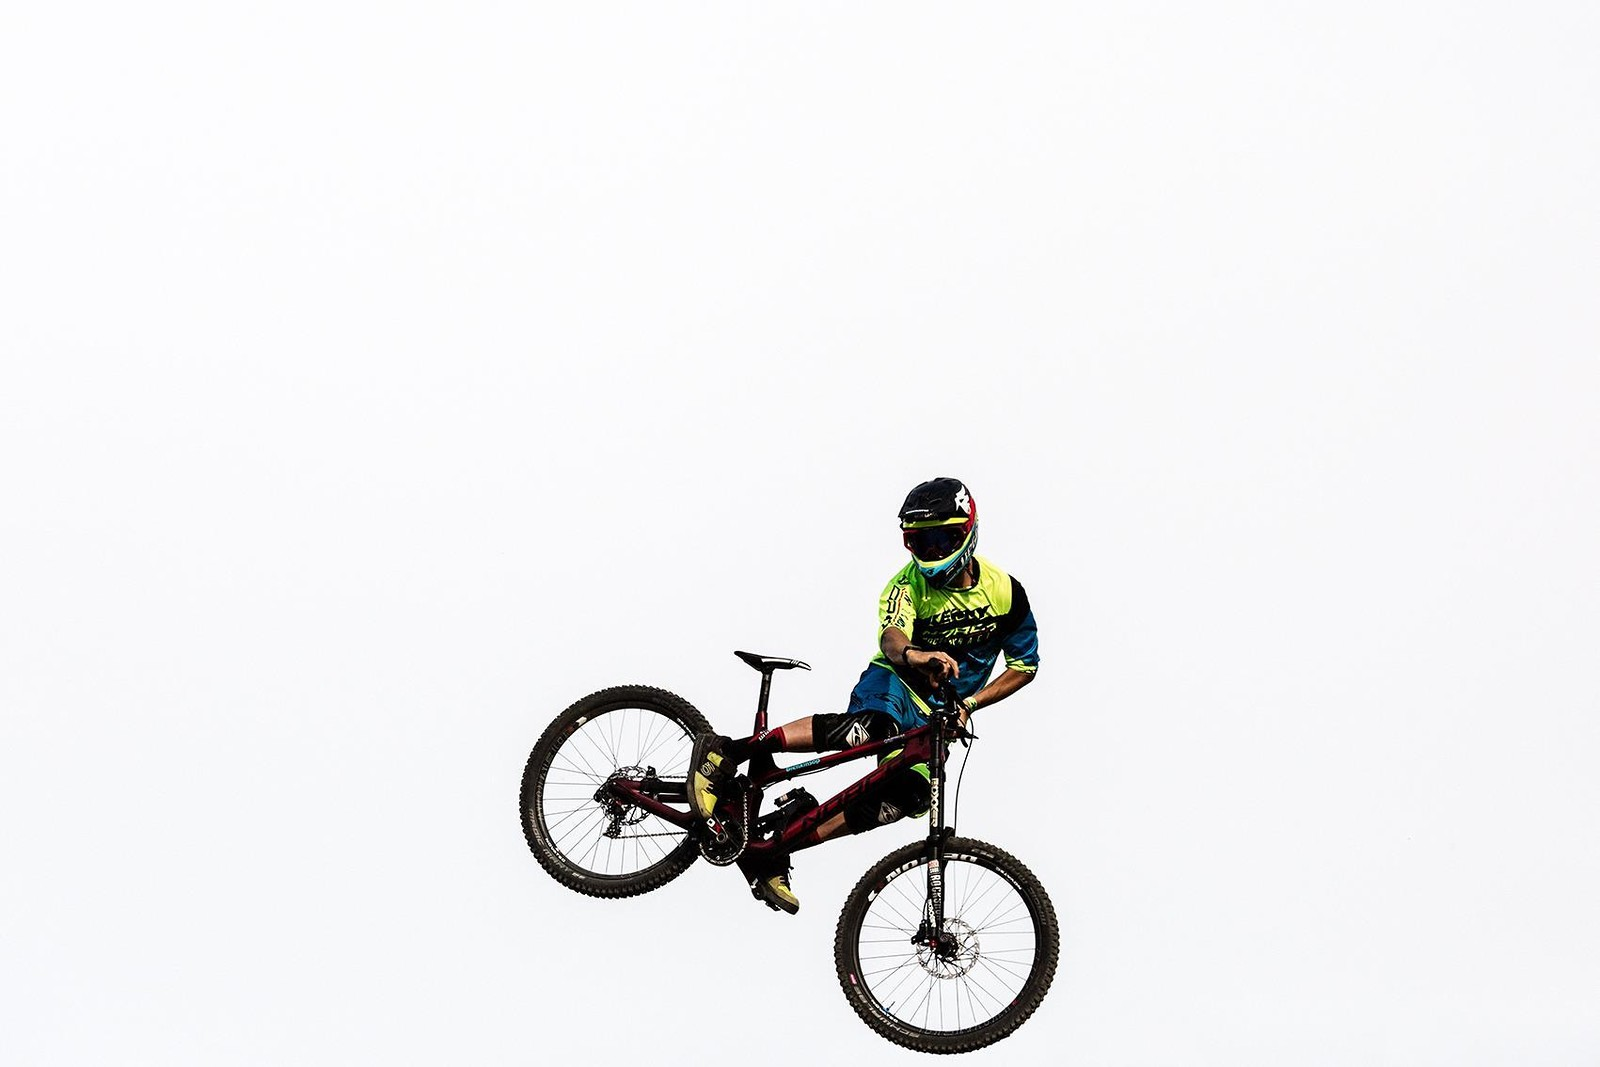 Crankworx Innsbruck_4 - Bluegrass Eagle - Mountain Biking Pictures - Vital MTB